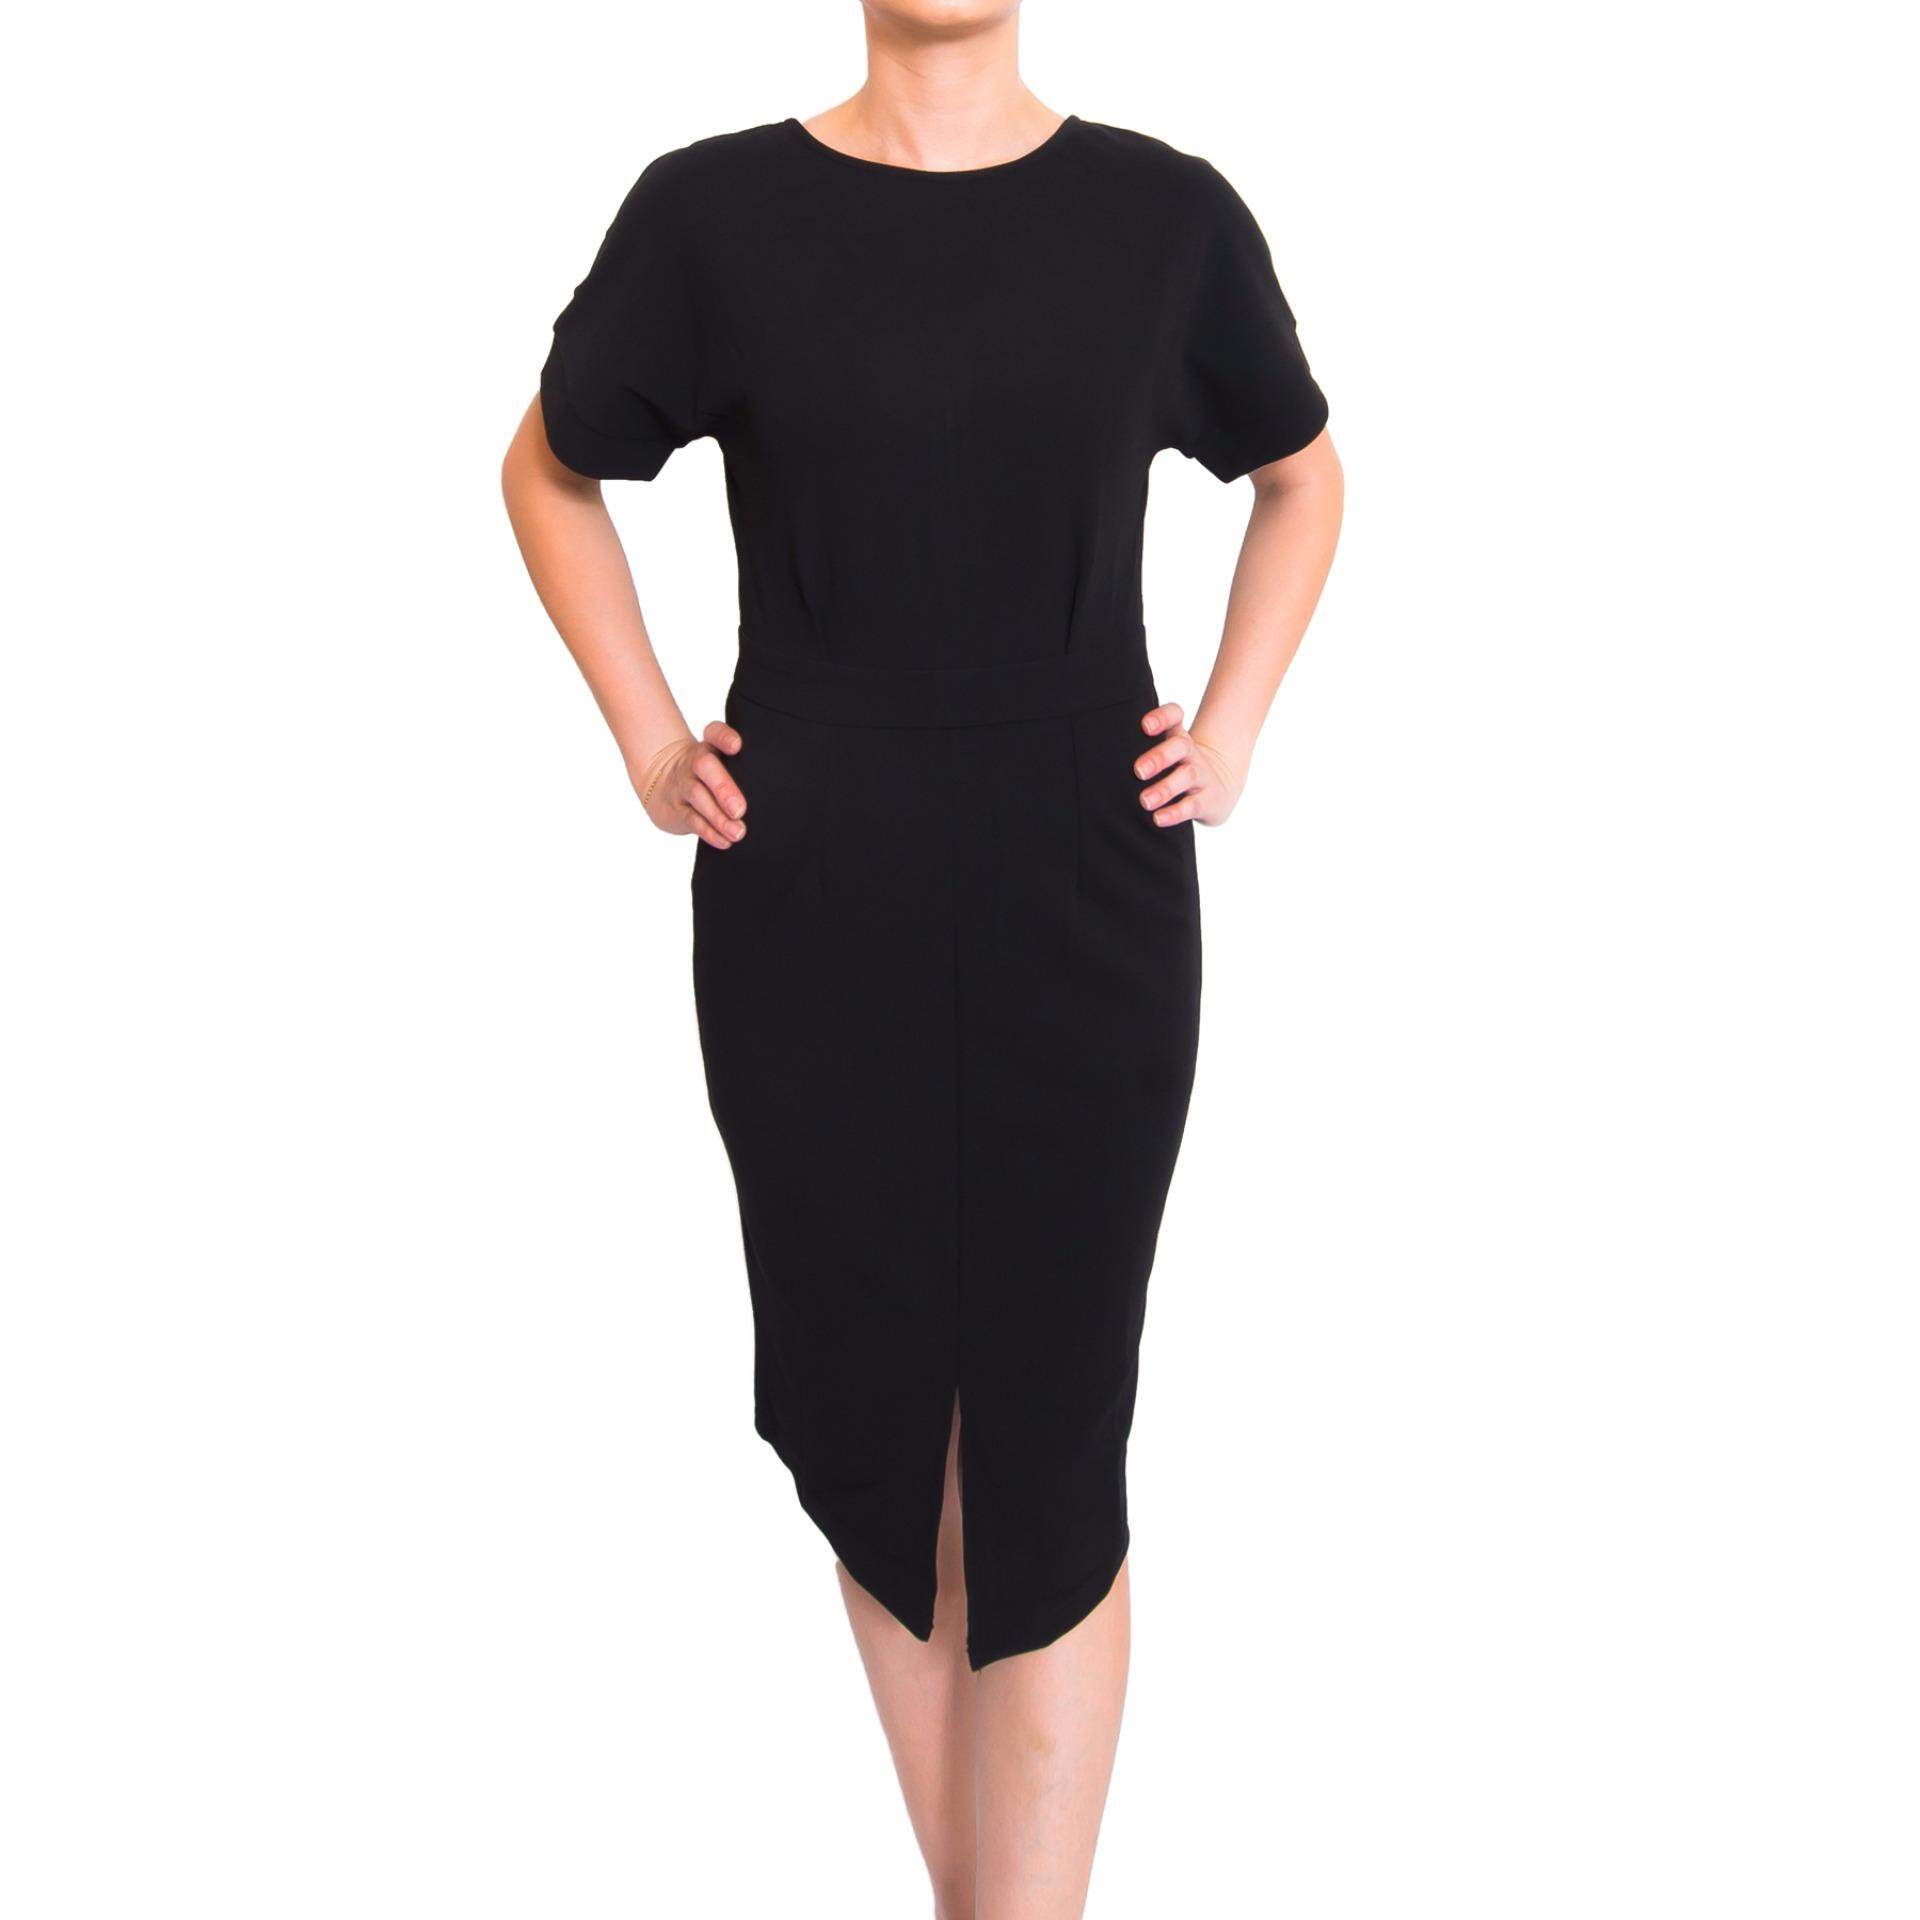 Kory & Lanza Lantern Sleeve bodycon dress in Black